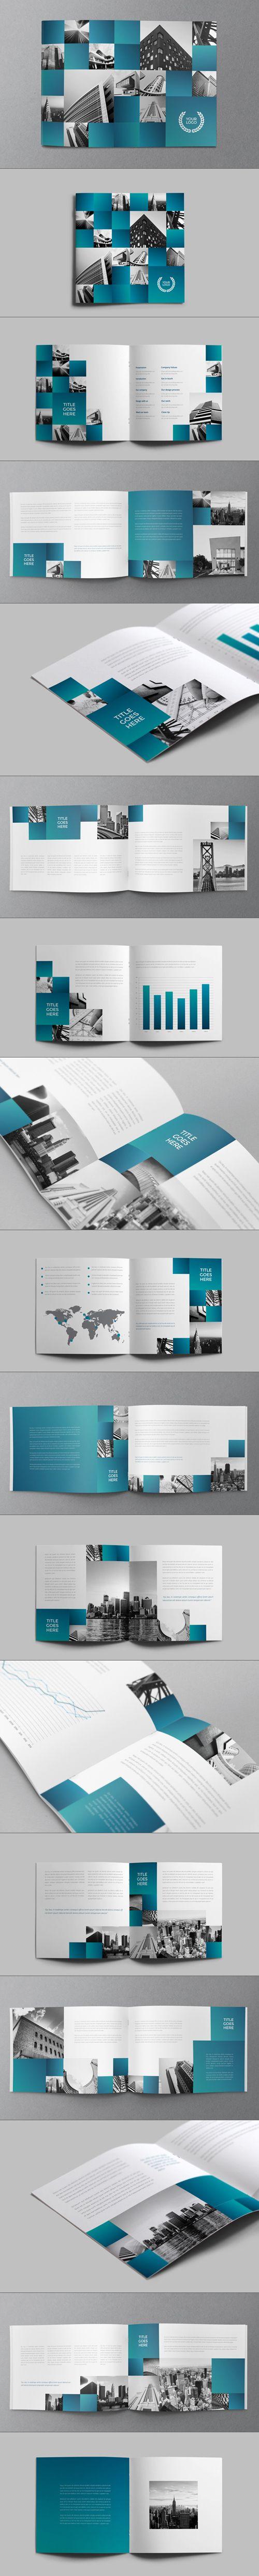 Professional Brochure Designs for Corporate Business | #brochuredesign | #Logodesignguru